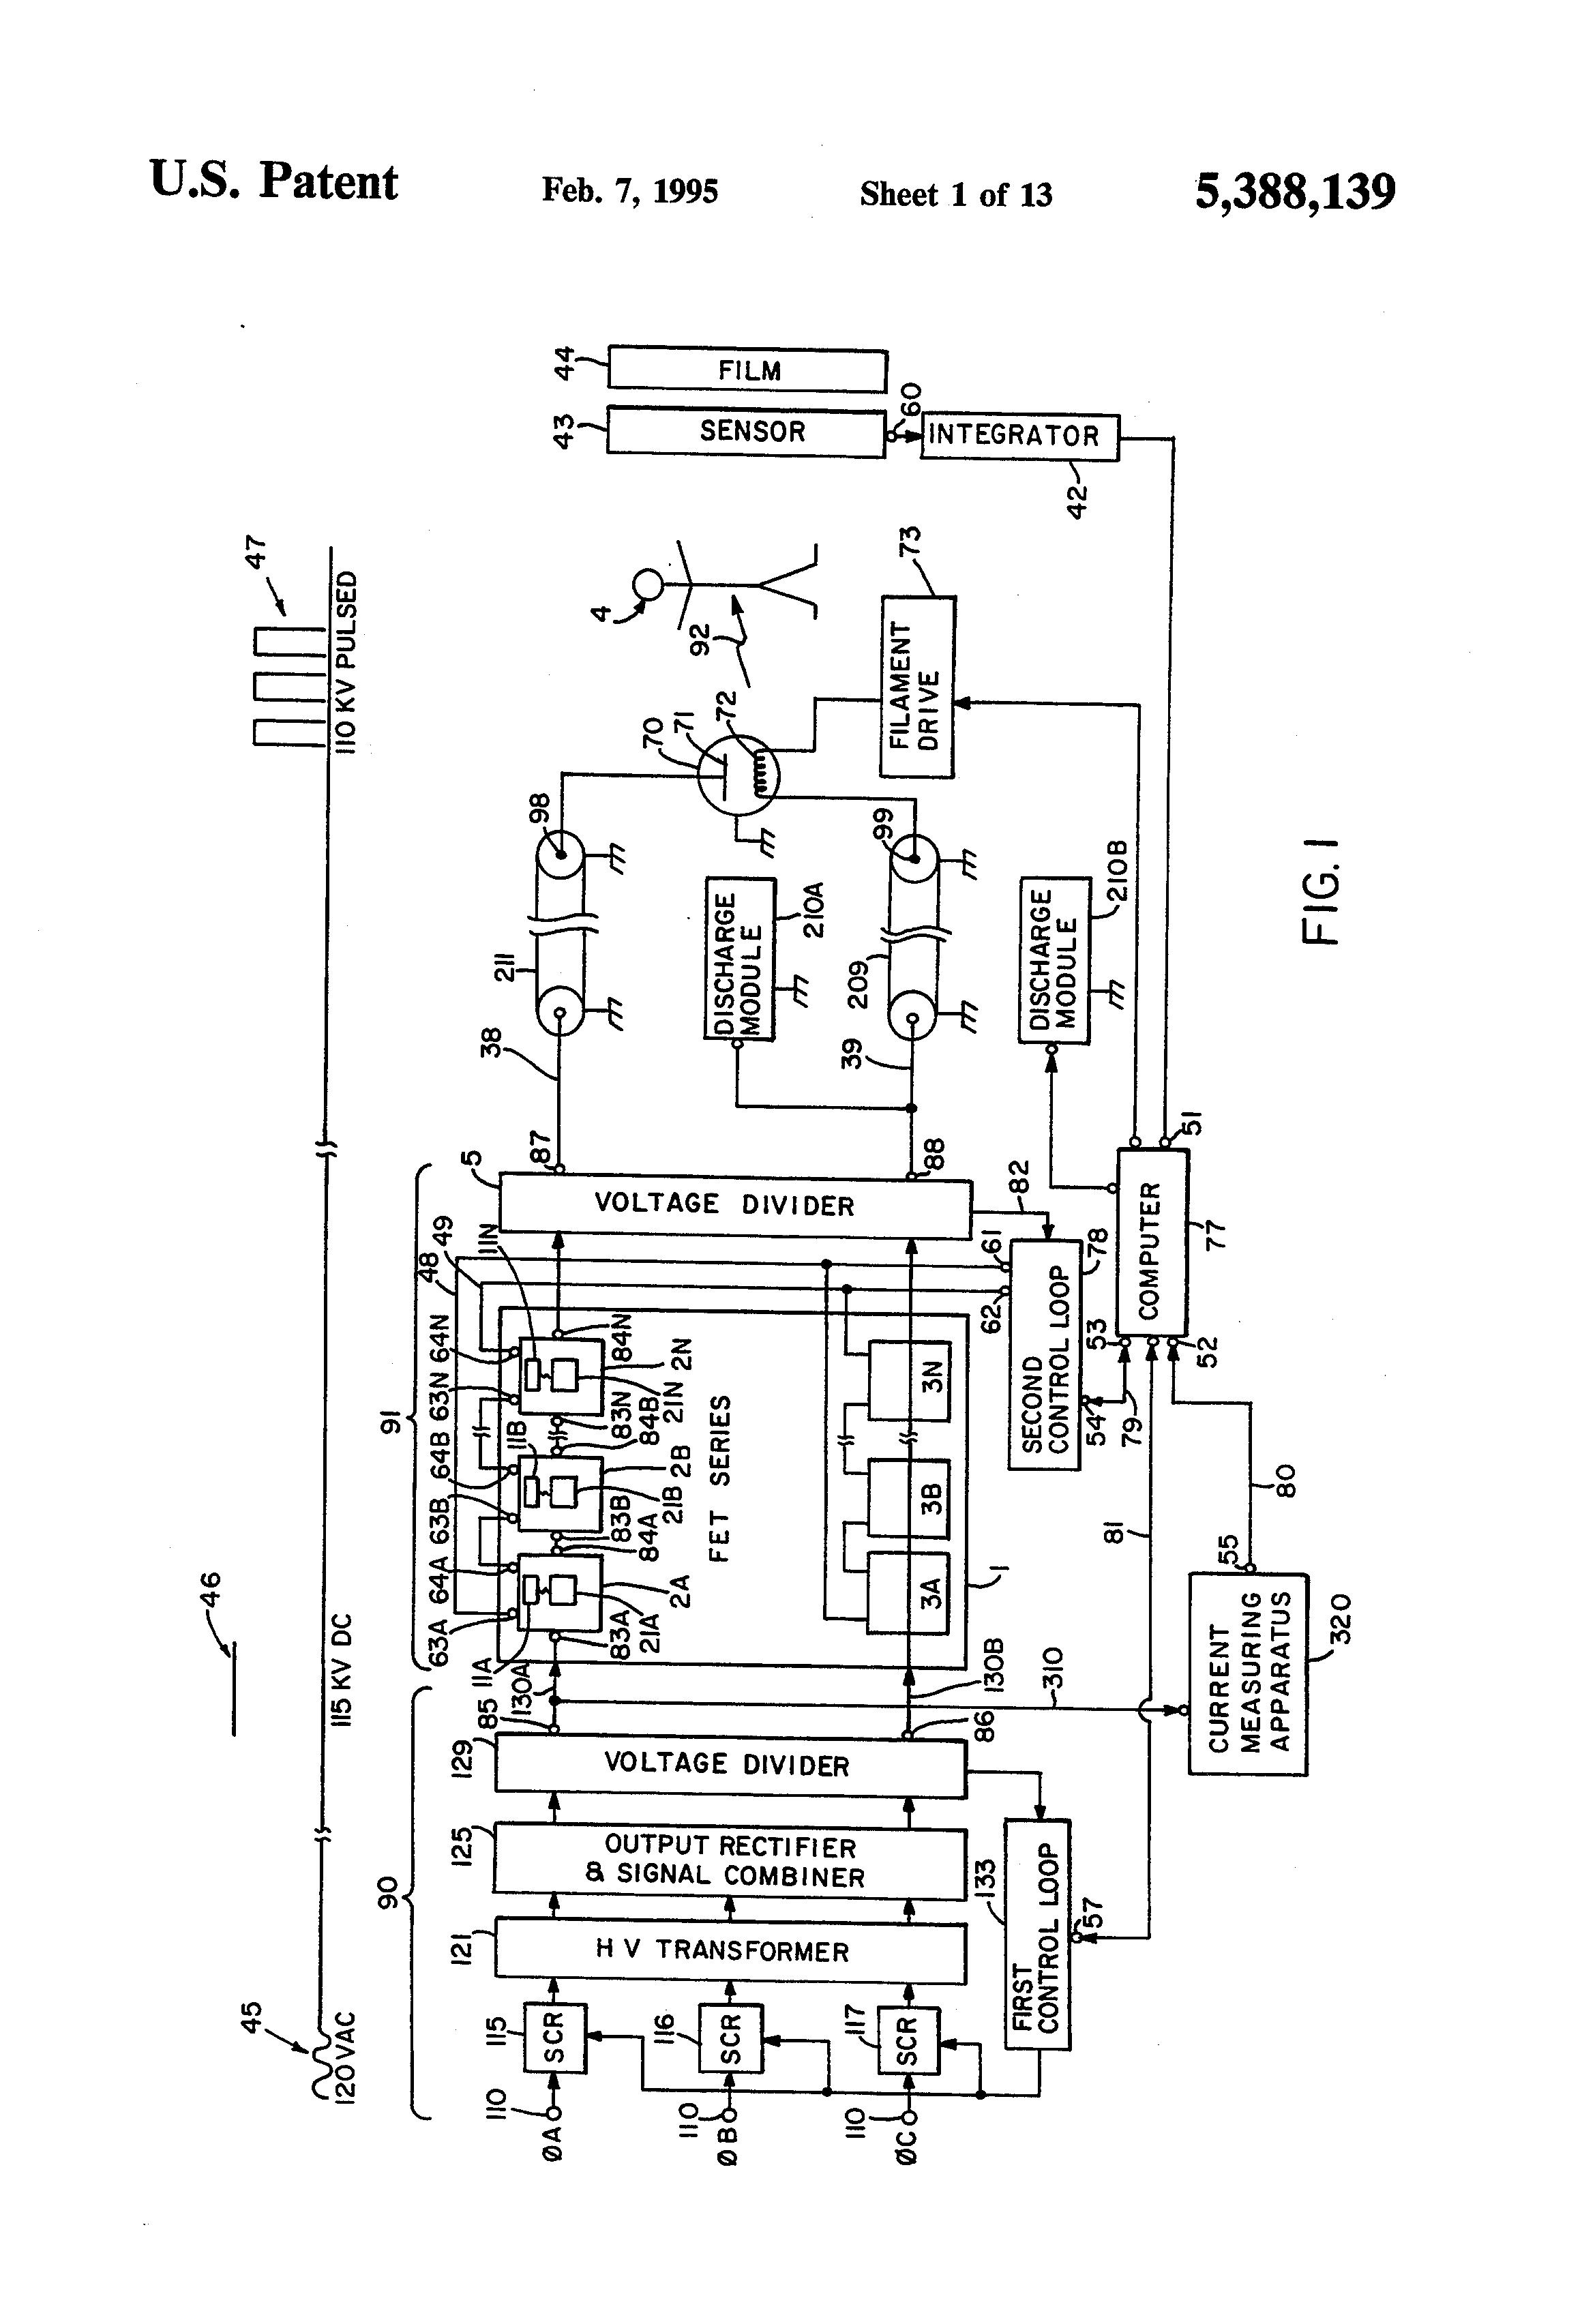 Patent Us5388139 High Voltage Power Supply And Regulator Circuit Zenerdiodevoltageregulatorcircuitdesign Clinic Drawing